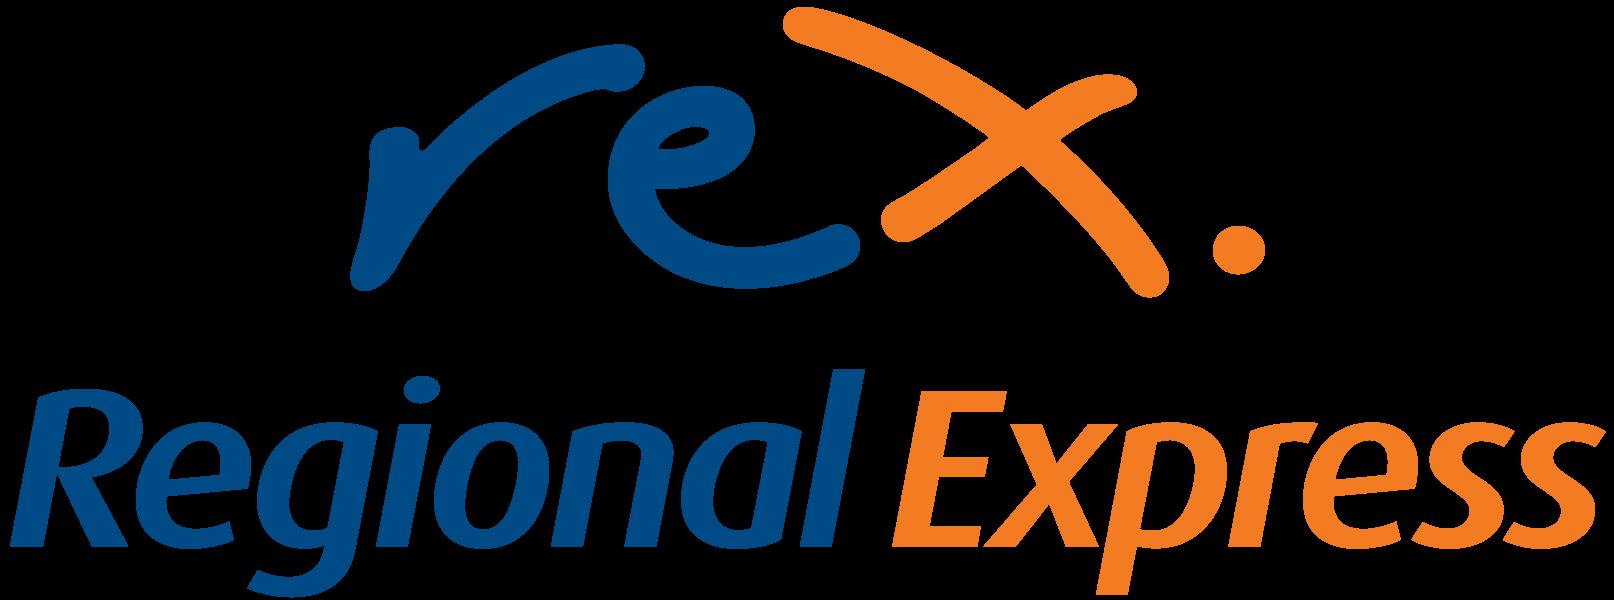 regional-express.png